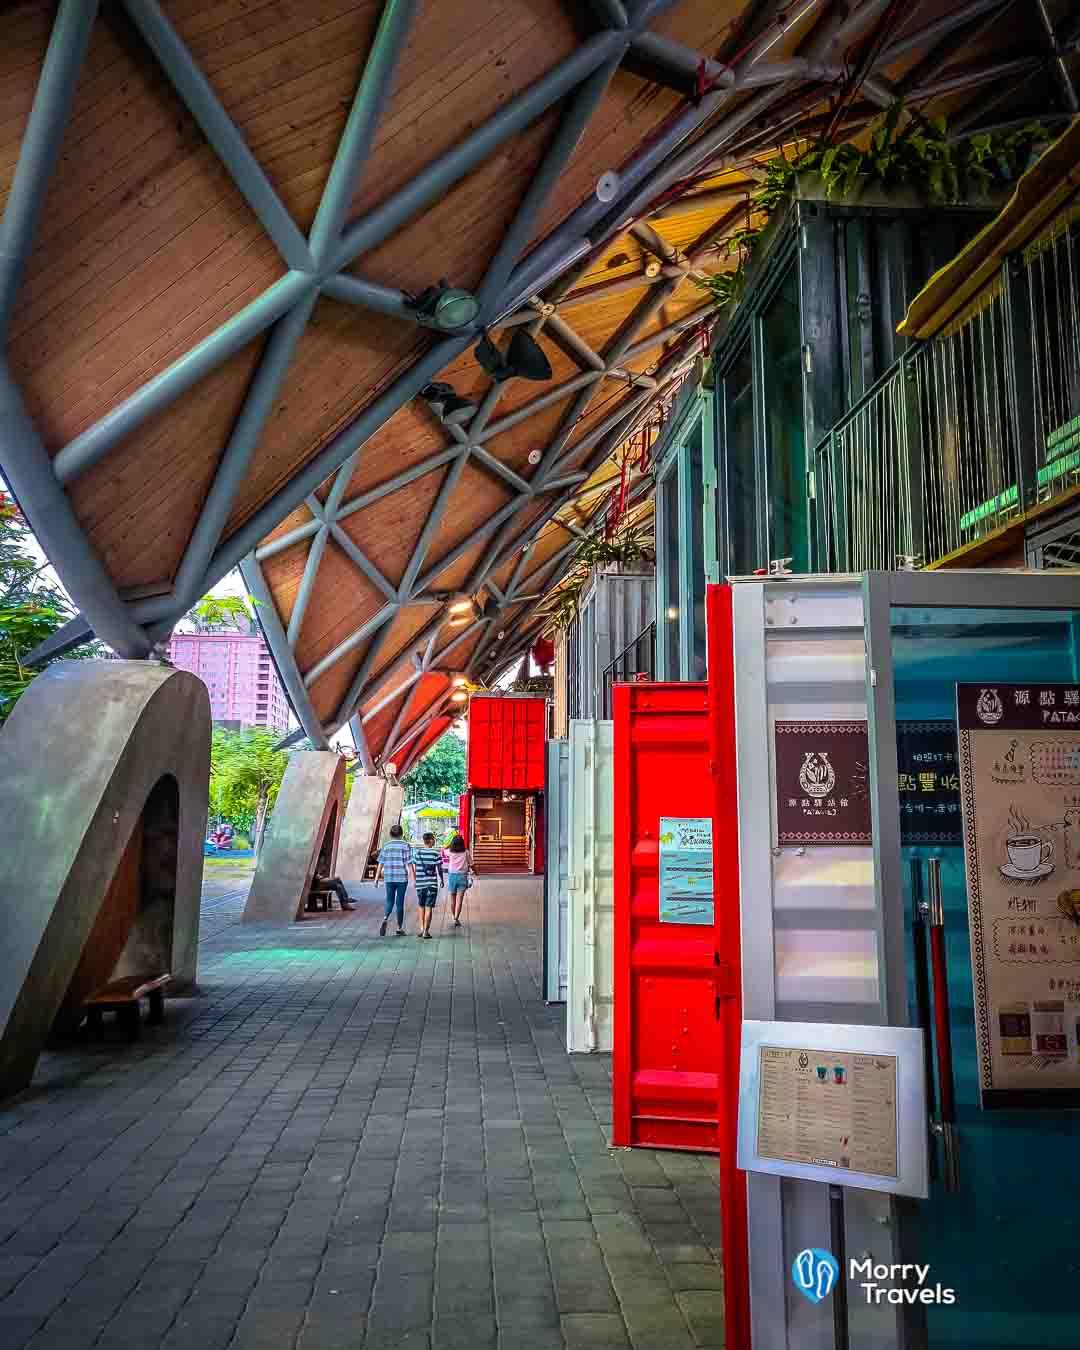 Morry Travels   Railway Art Village, Tiehua Music Village